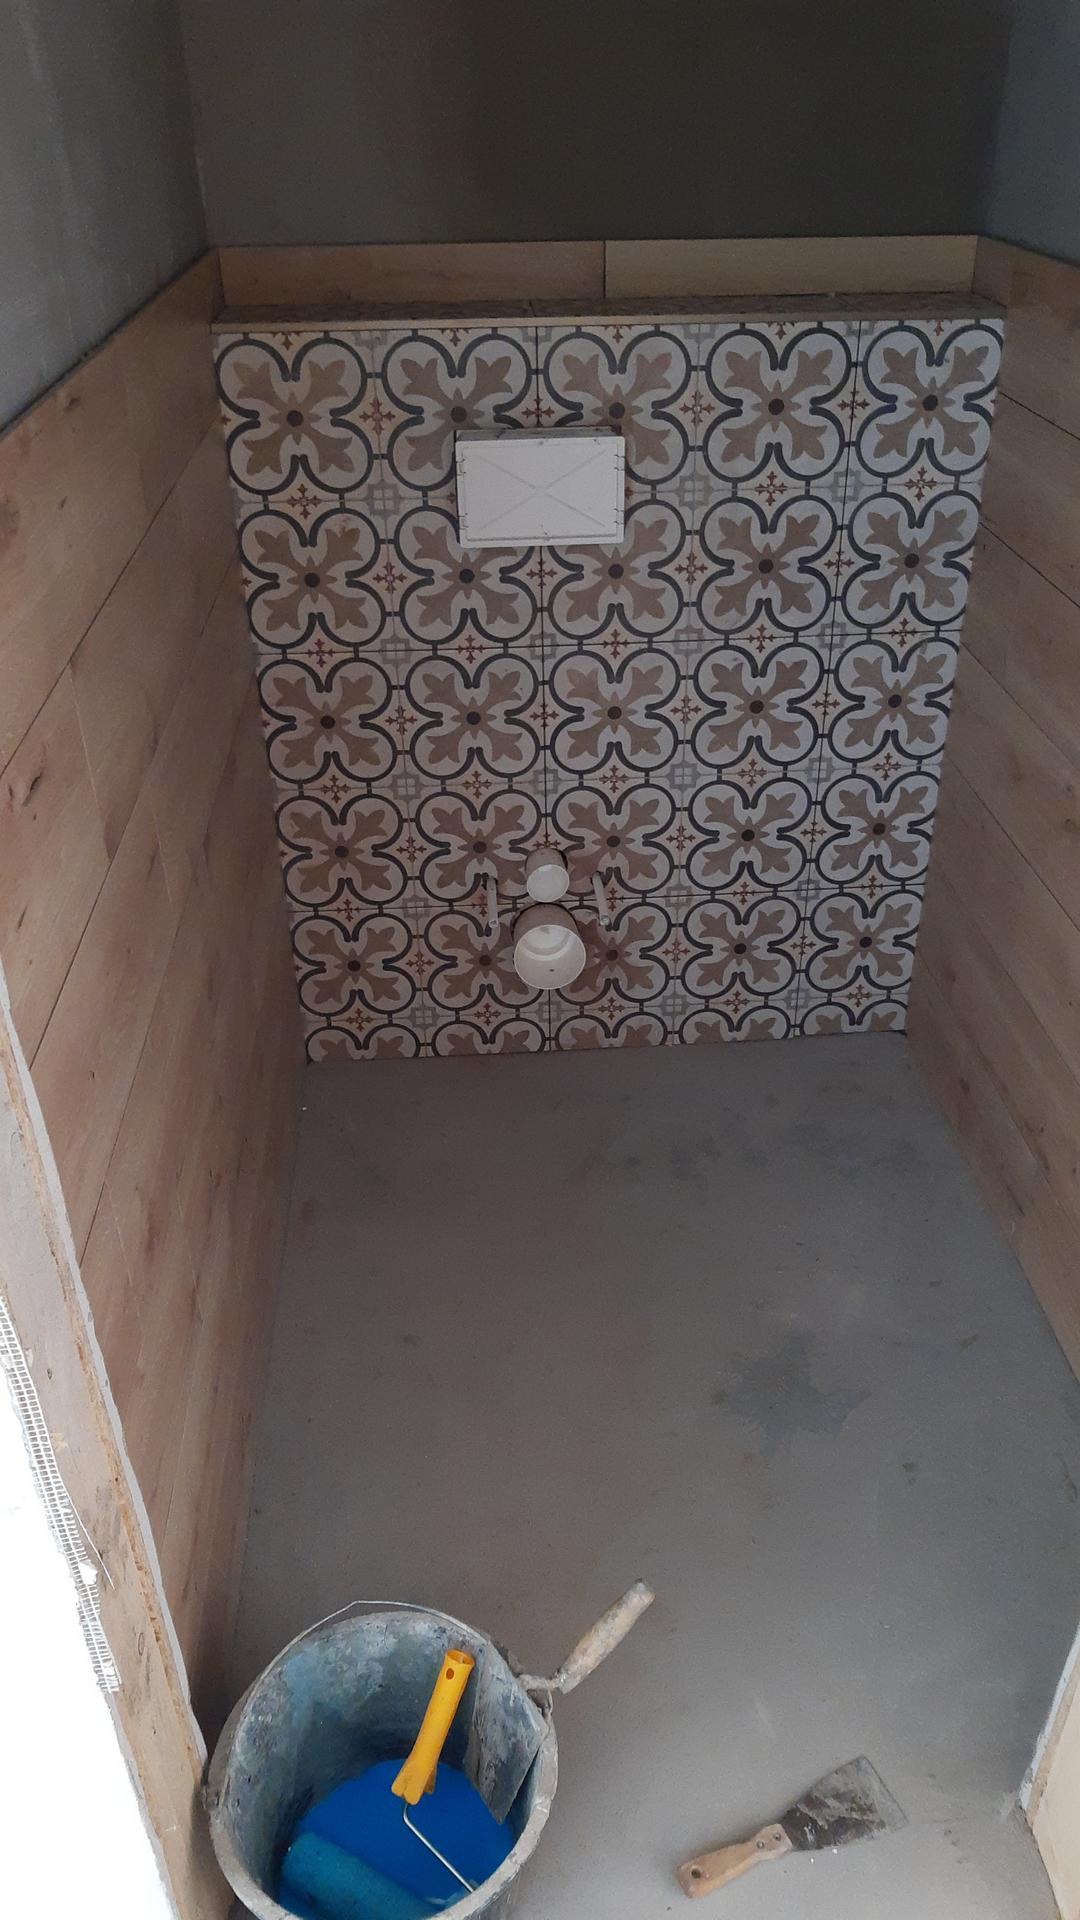 Pomalu ale snad jiste :) - A jedno wc uz temer hotovo.. juchu.. za tyden uz to pry bude kompletka 🙏❤️